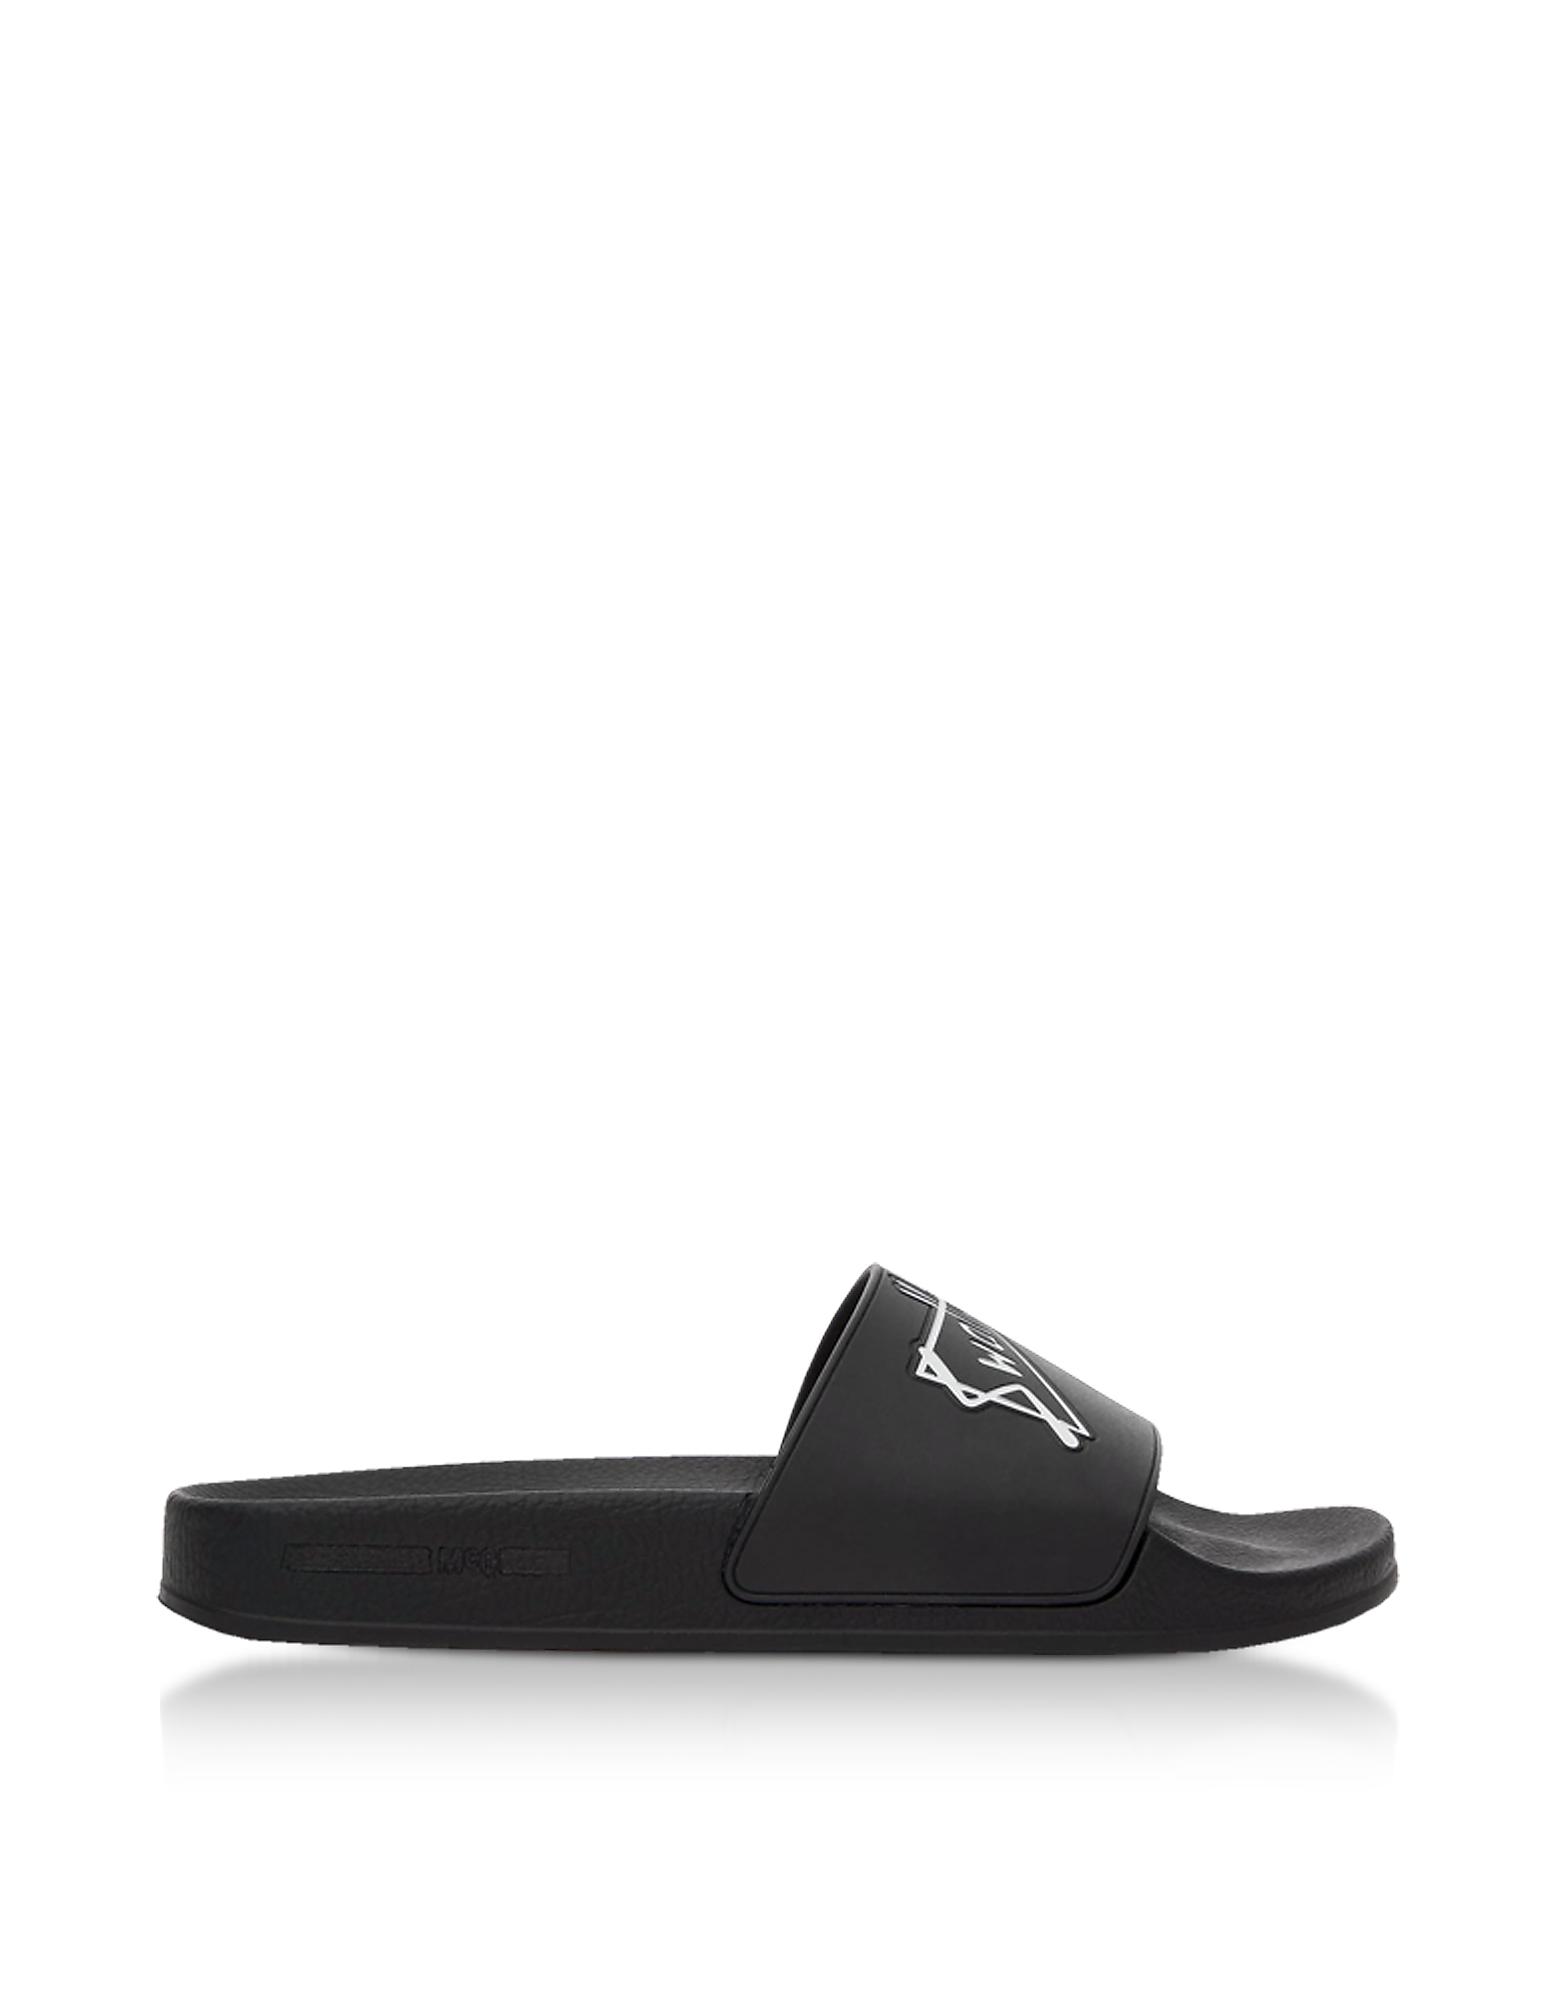 McQ Alexander McQueen Designer Shoes, Black Swallow Slide Sandals